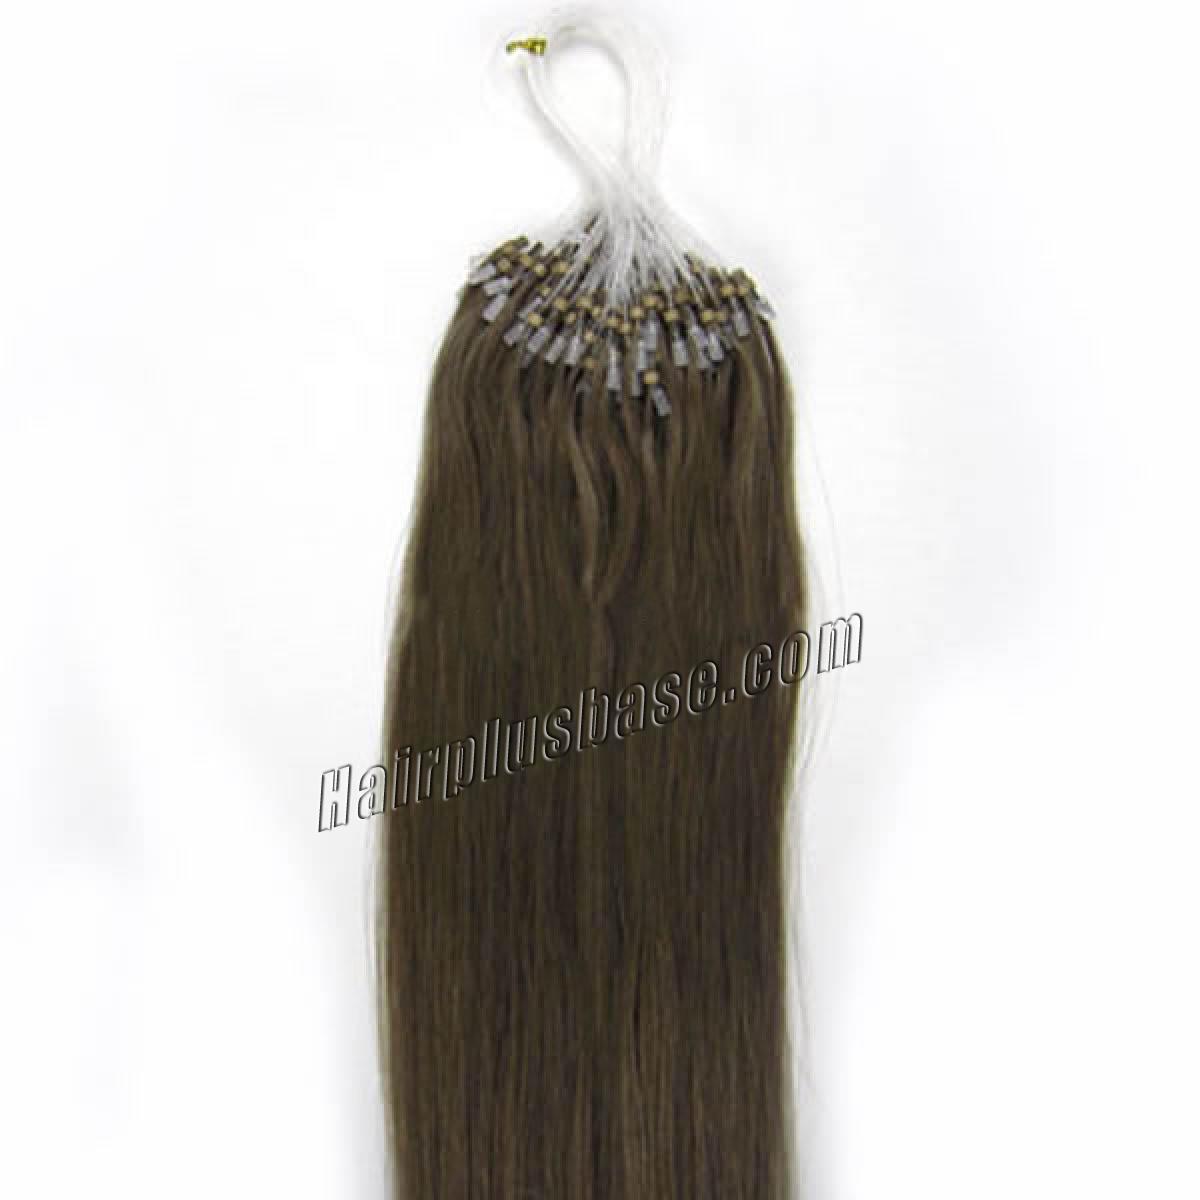 34 inch  8 ash brown micro loop human hair extensions 100s 100g 12408 1v